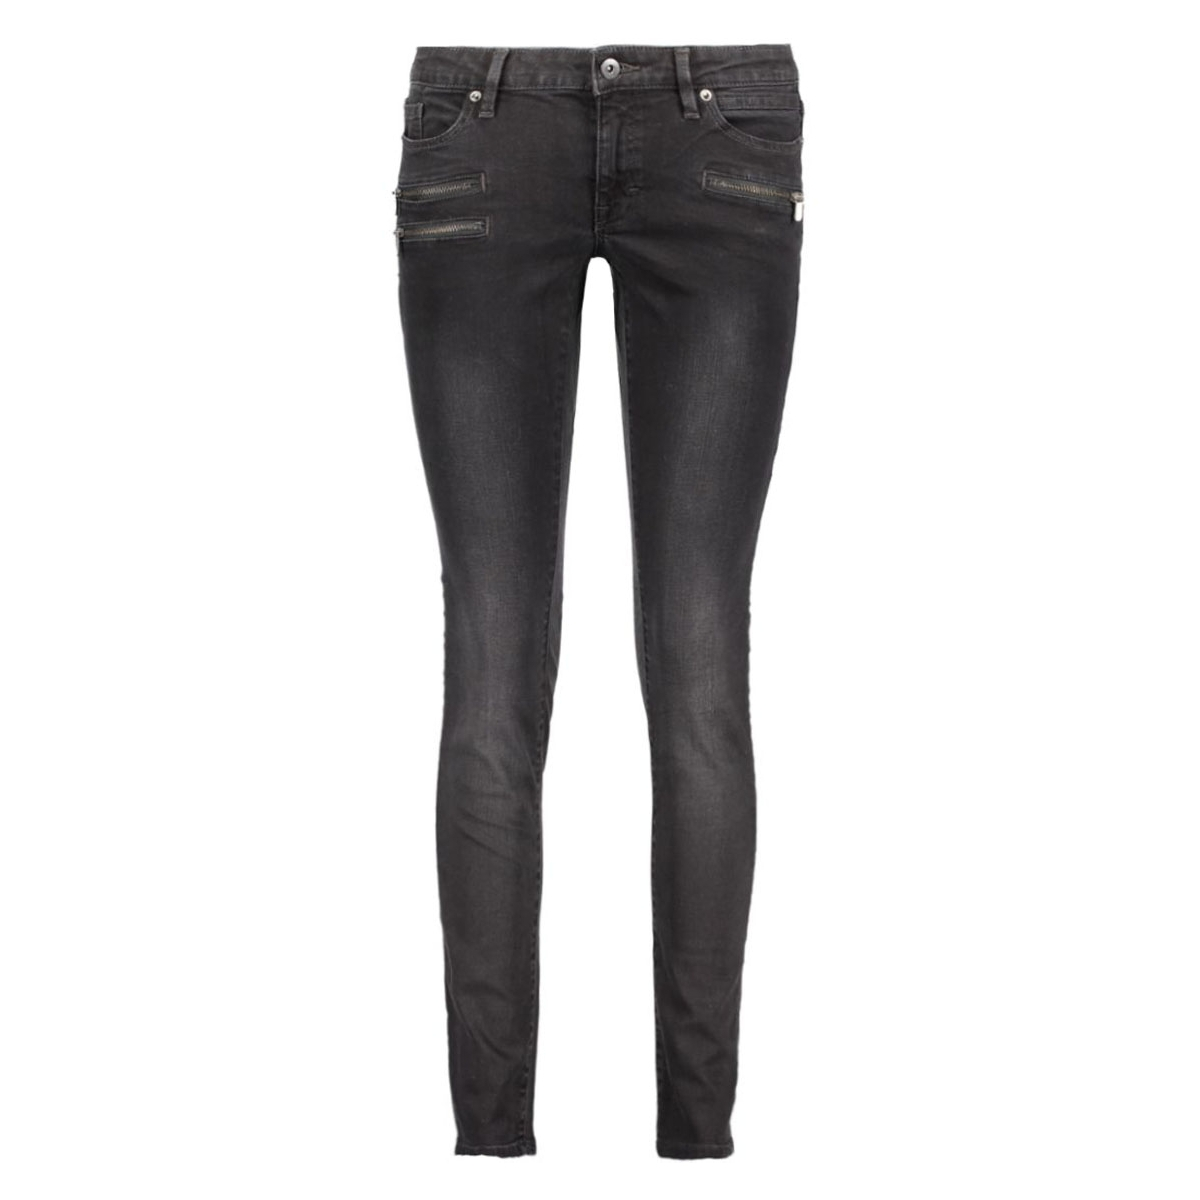 096cc1b029 edc jeans c911